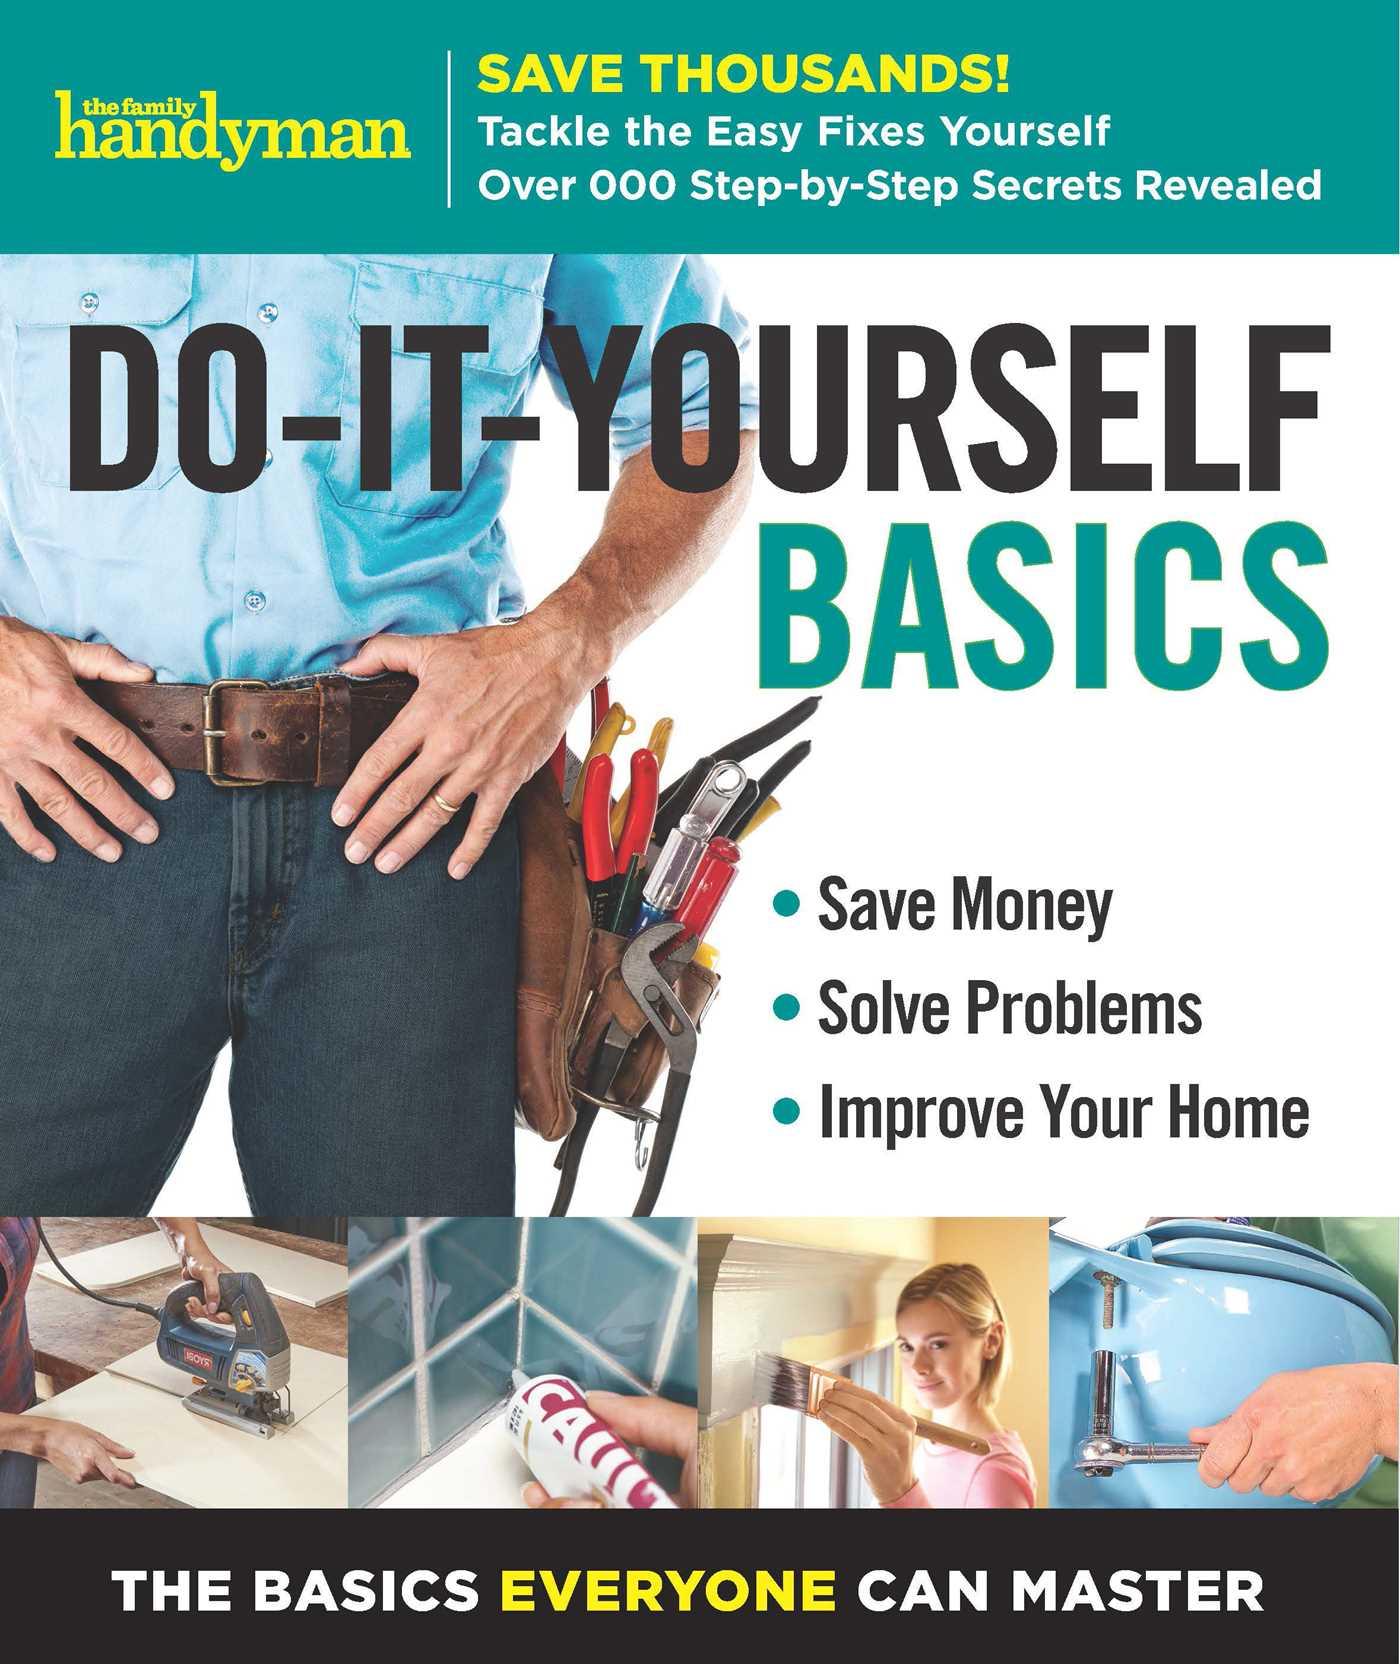 Family Handyman Do-It-Yourself Basics Volume 2 | Book by